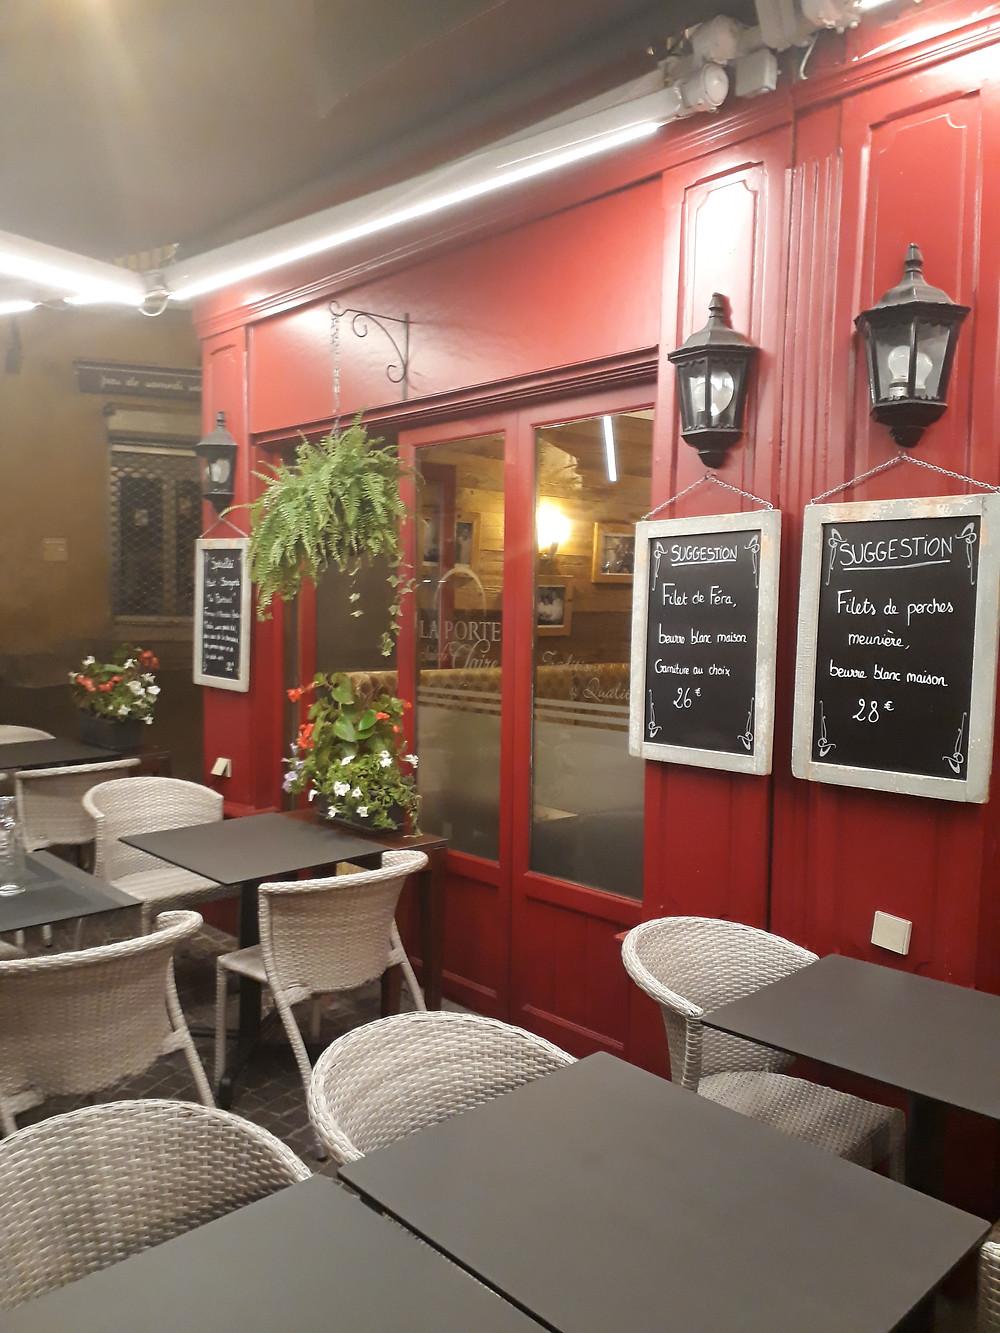 porte sainte claire restaurant annecy